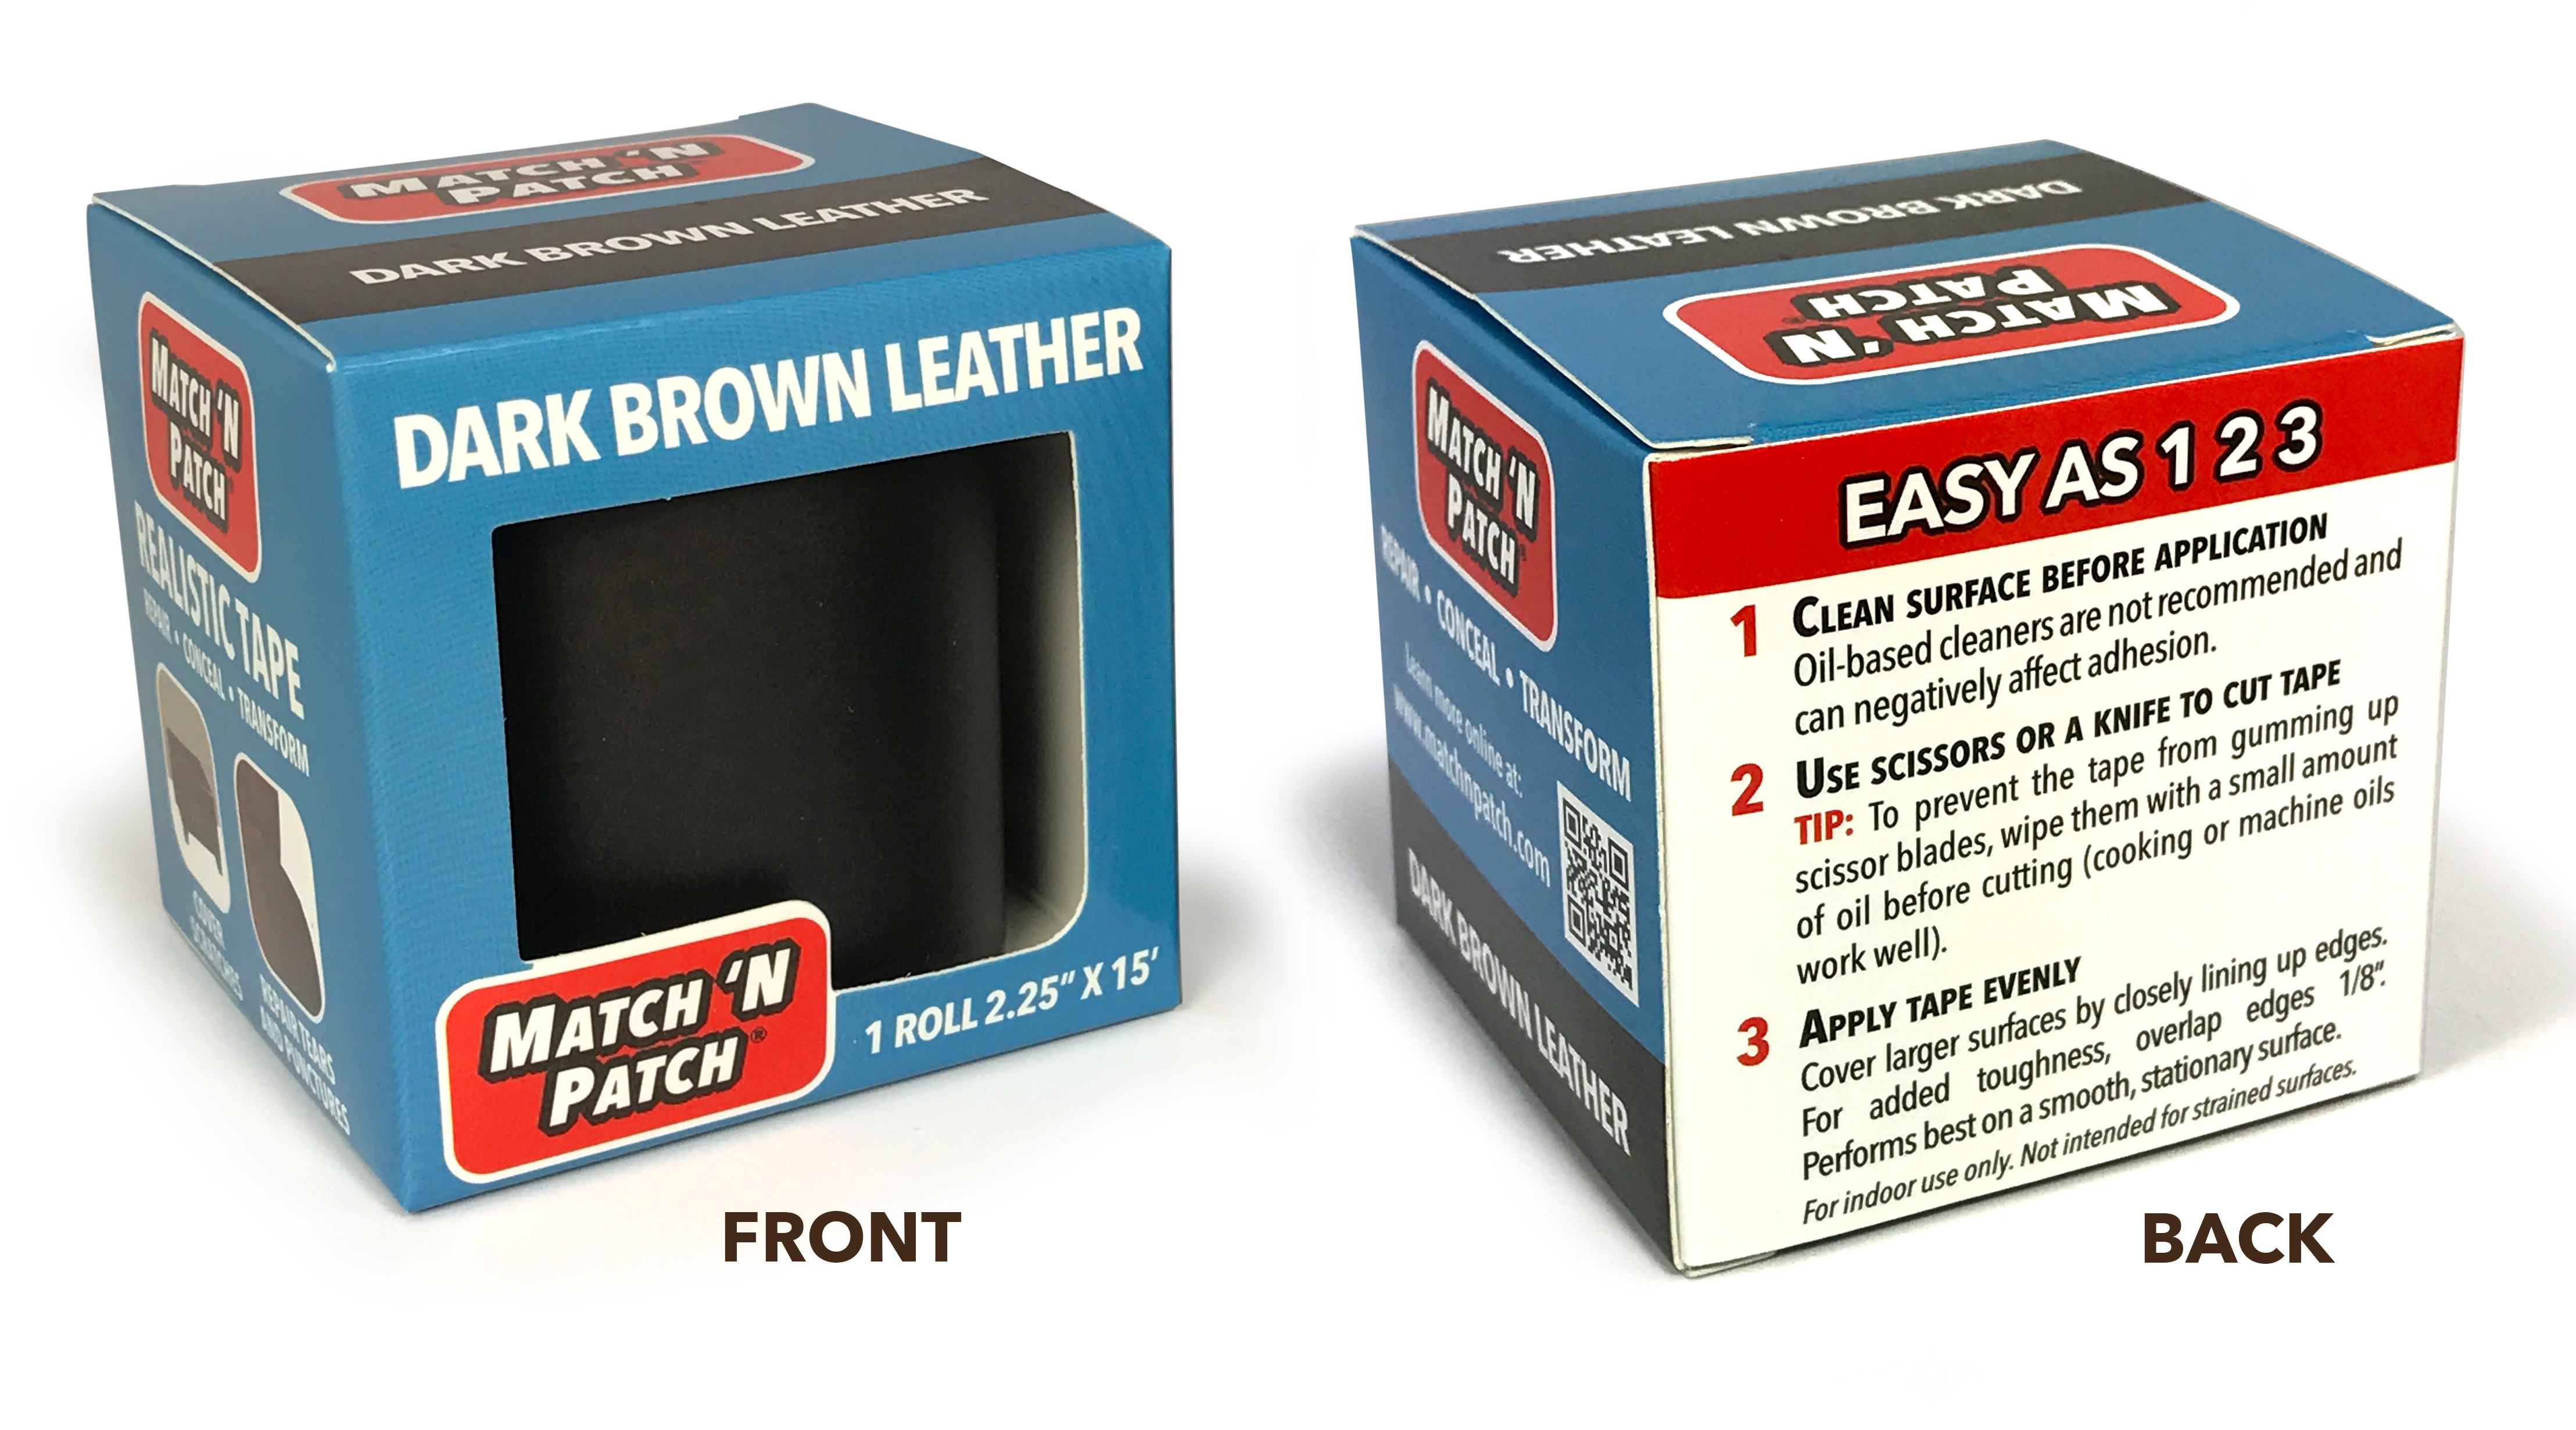 Match N Patch Dark Brown Leather Repair Tape 2 25 In X 15 Ft Walmart Com Walmart Com